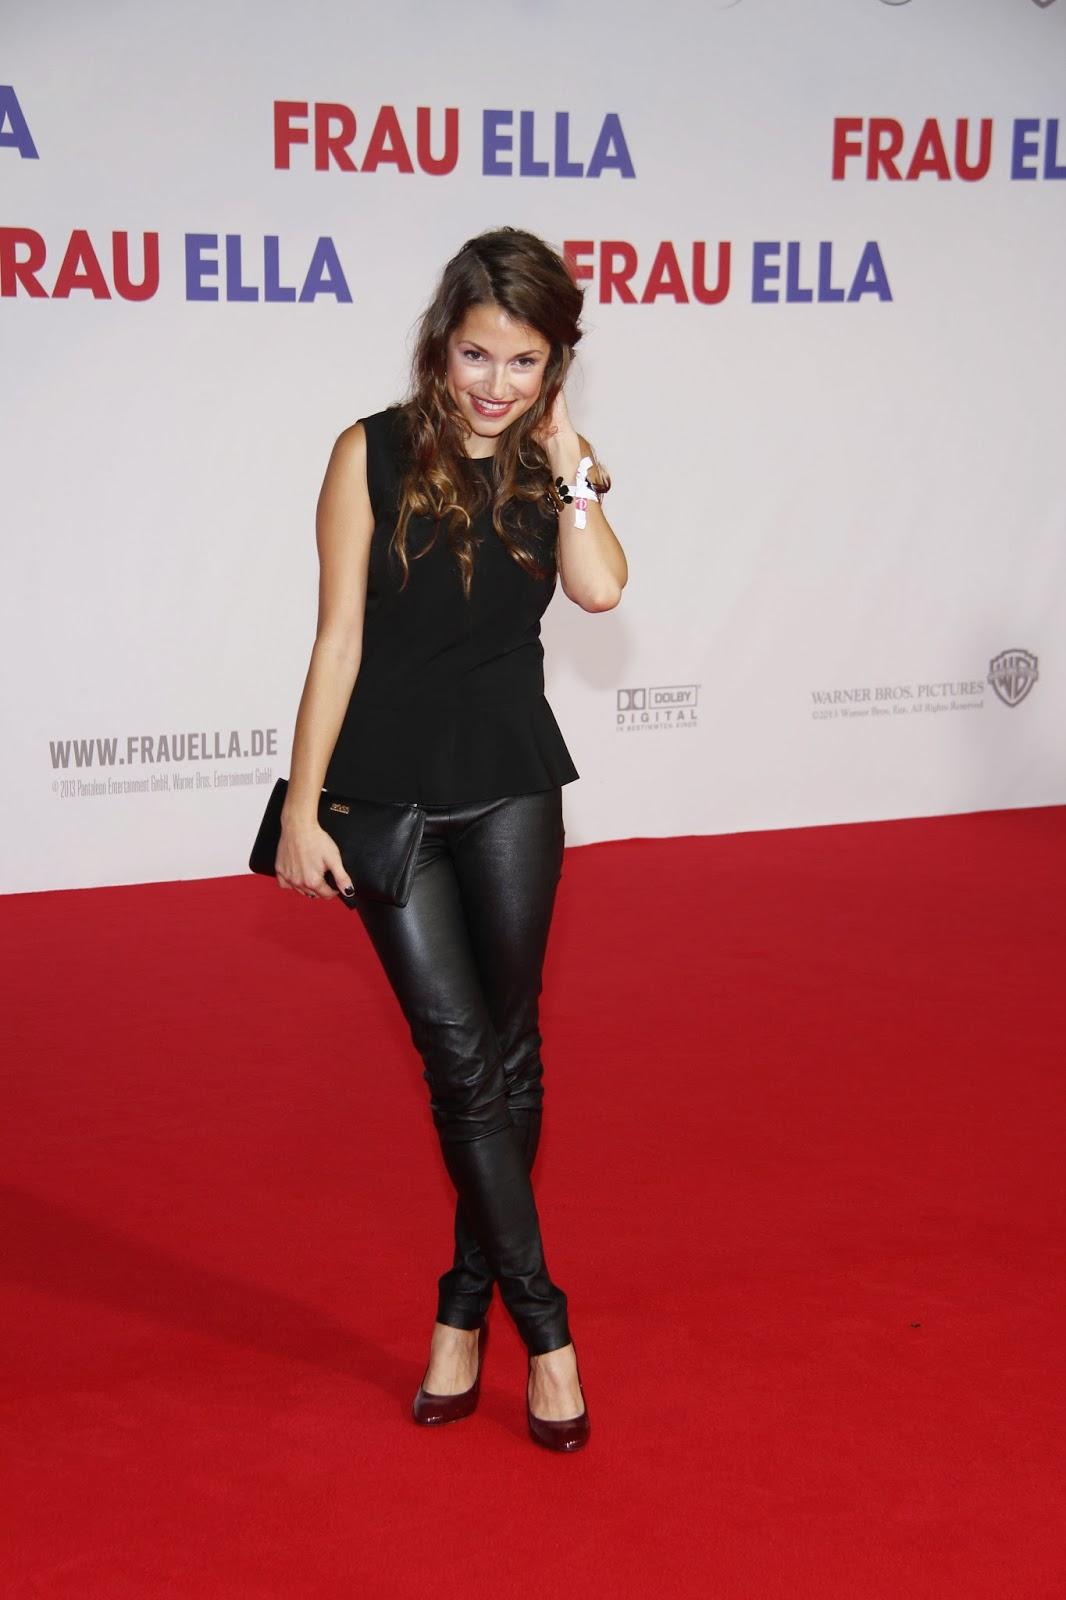 German women in leather anna julia kapfelsperger in leather pants